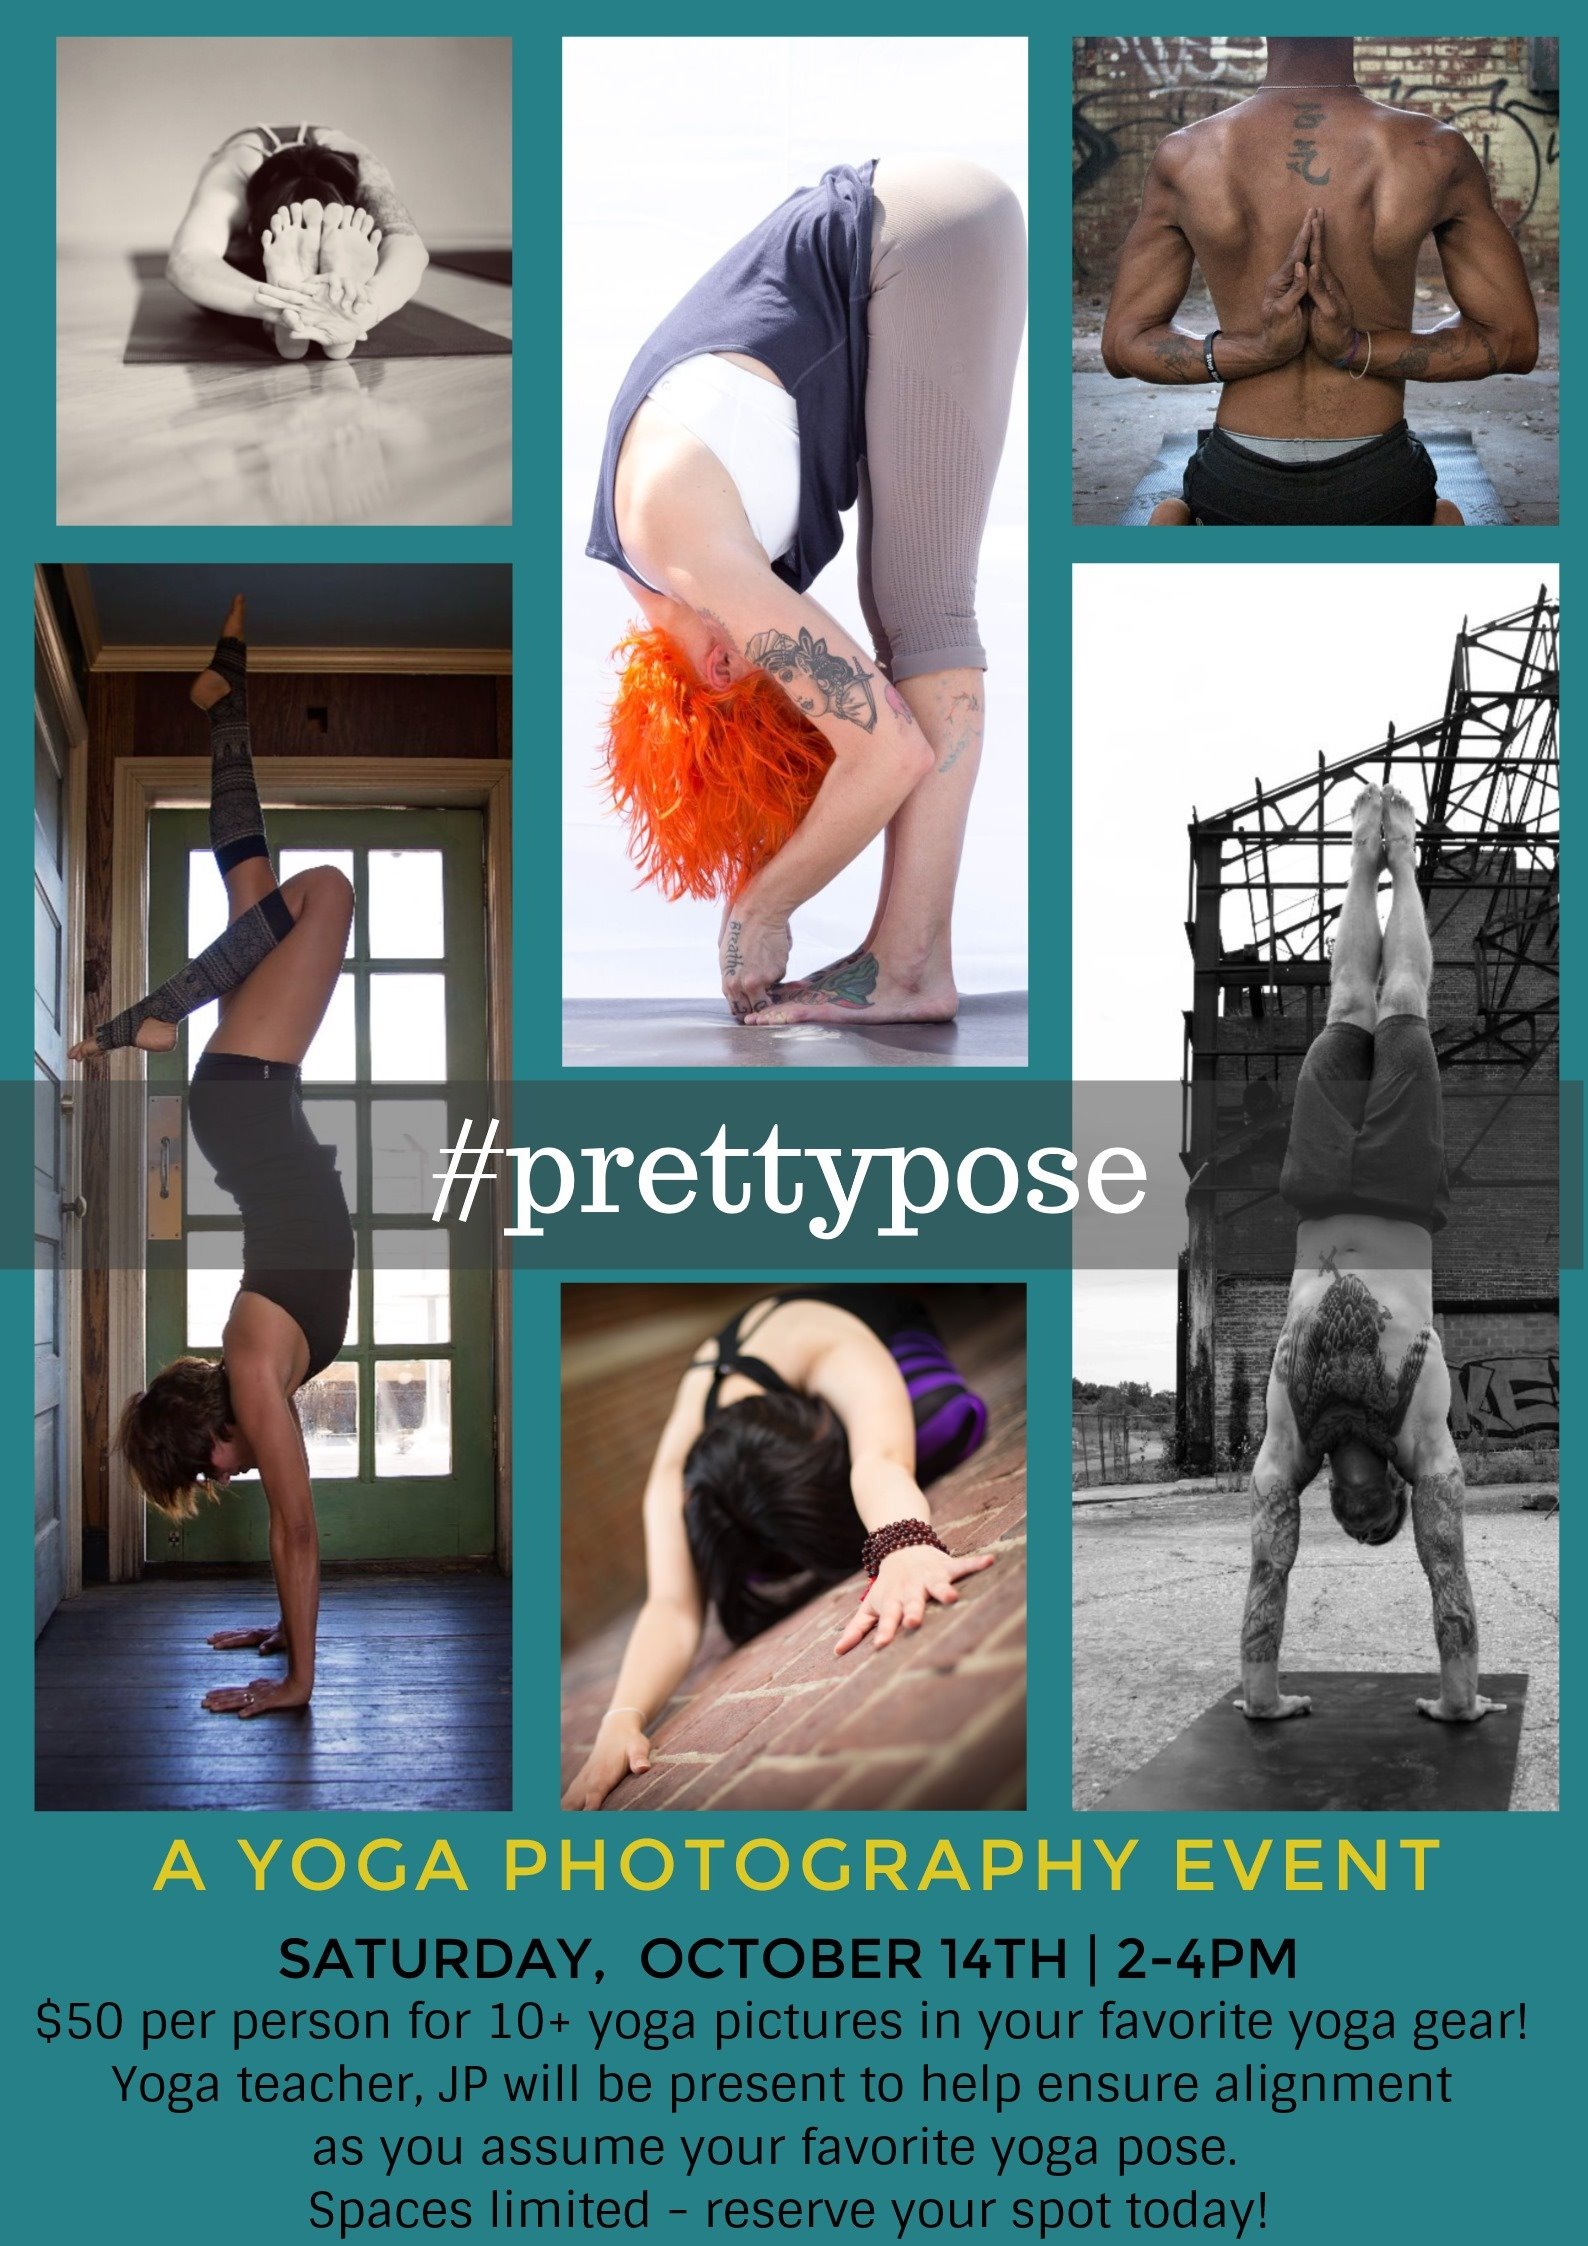 #prettypose - 2